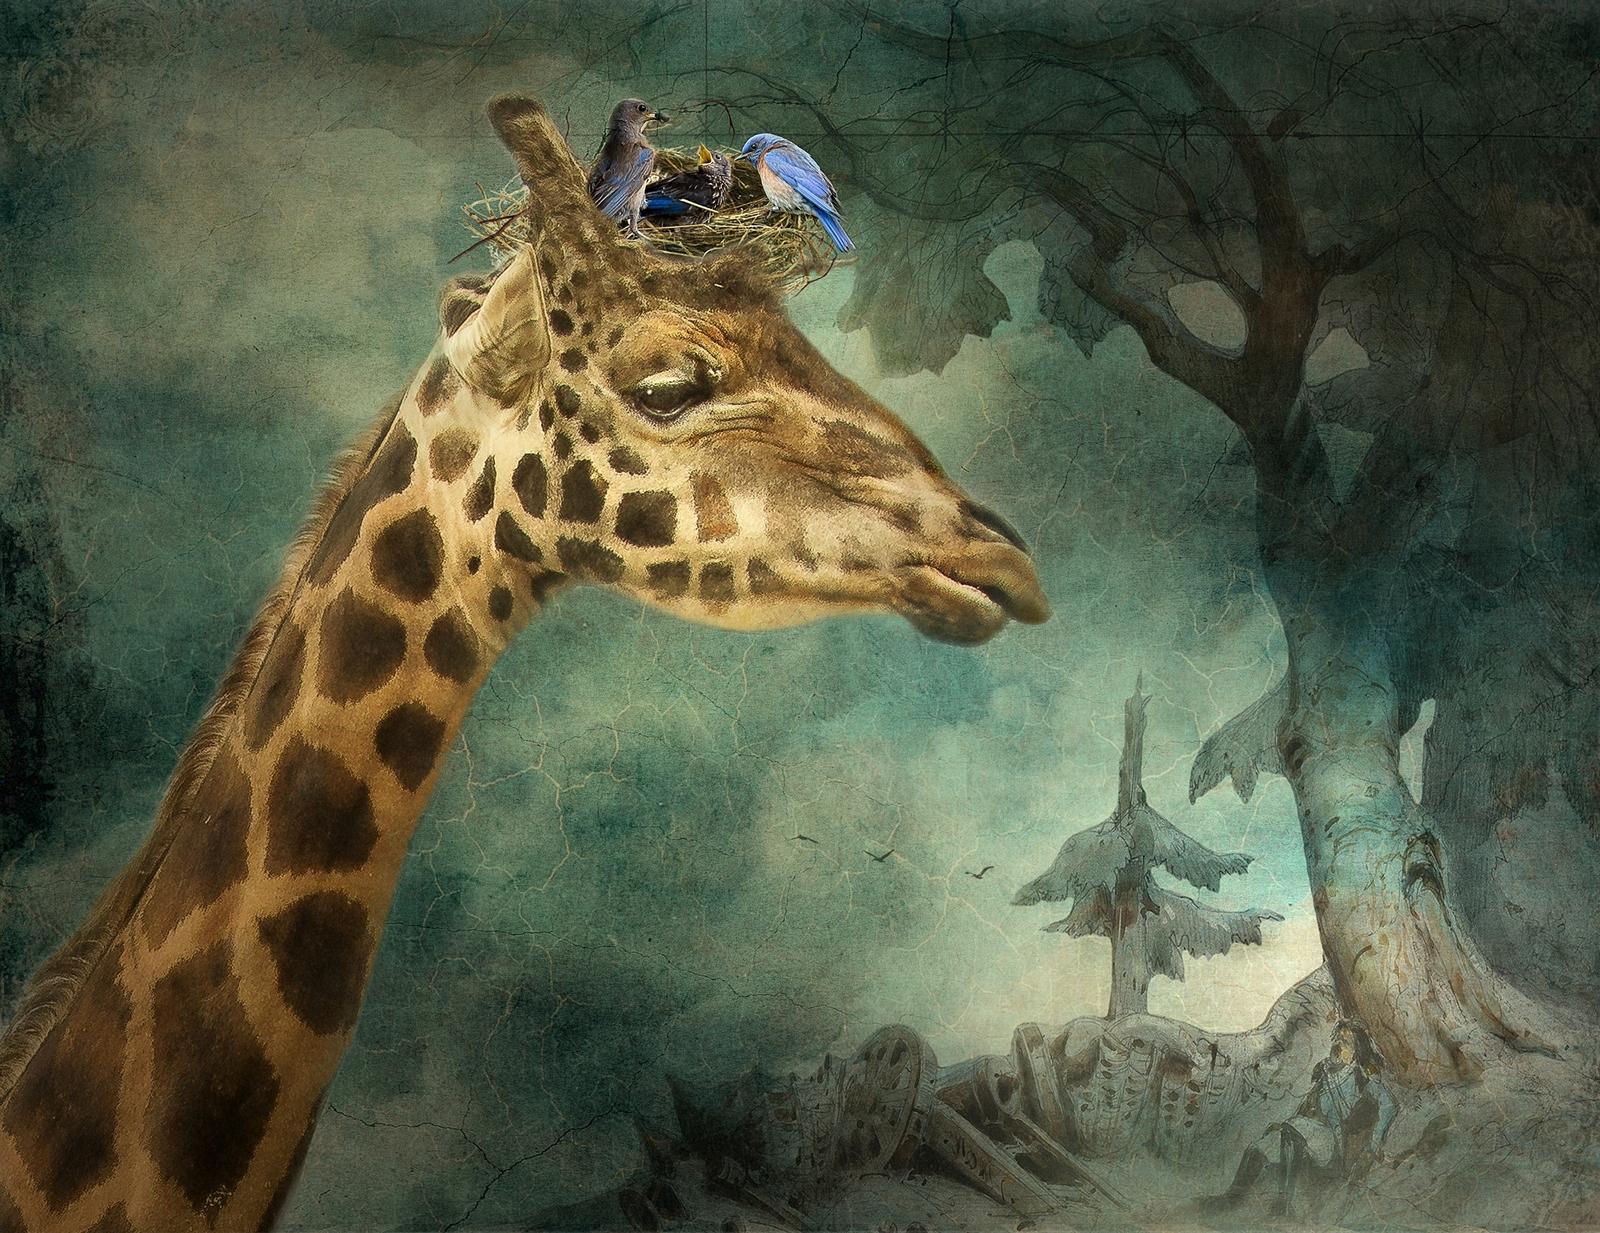 Kind Giraffe, Saving the Bluebirds